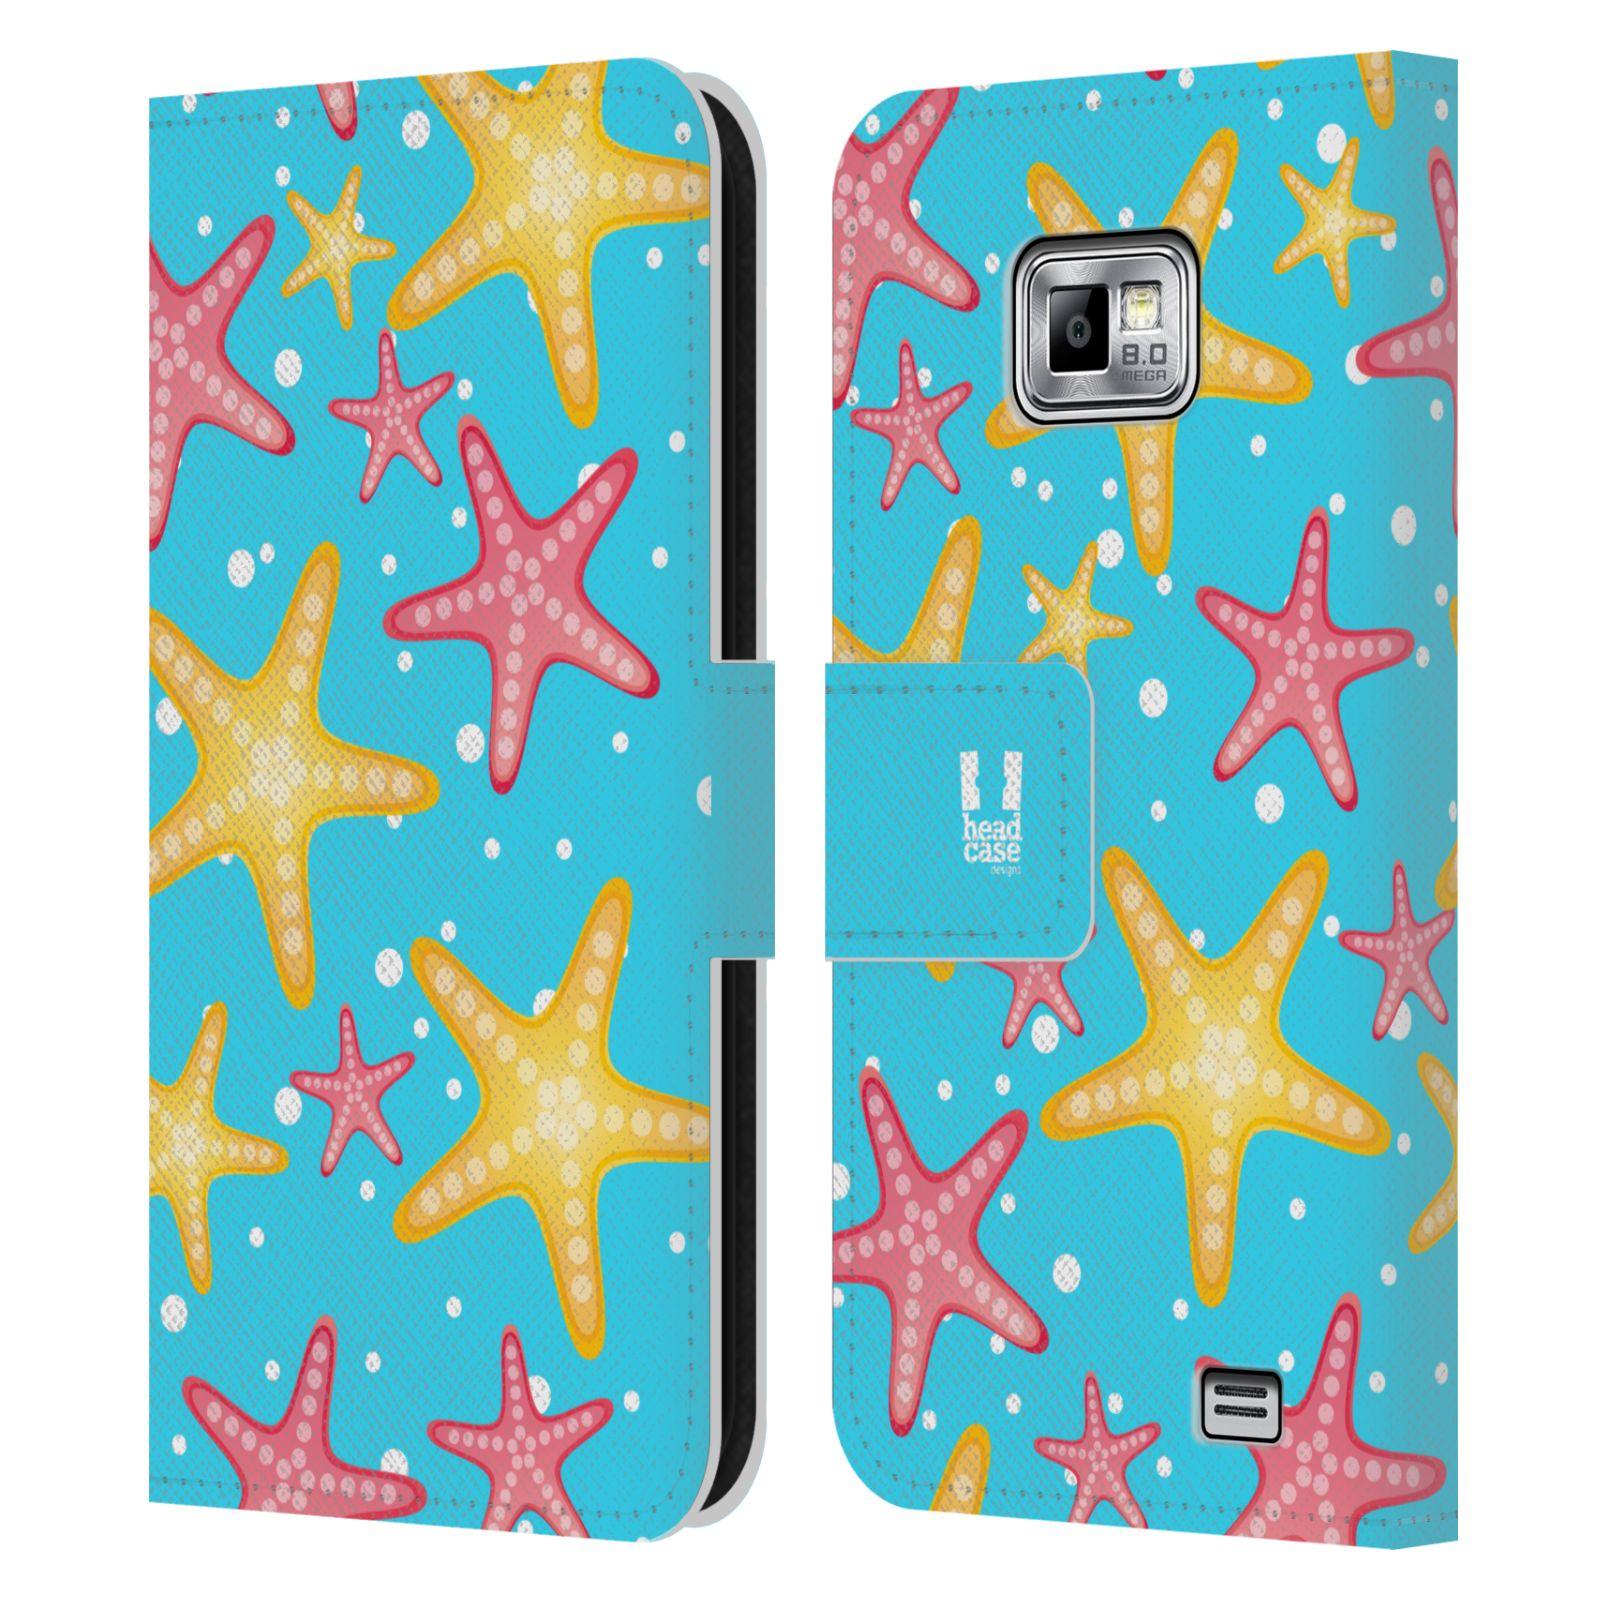 HEAD CASE Flipové pouzdro pro mobil Samsung Galaxy S2 i9100 Mořský živočich hvězdice modrá barva pozadí